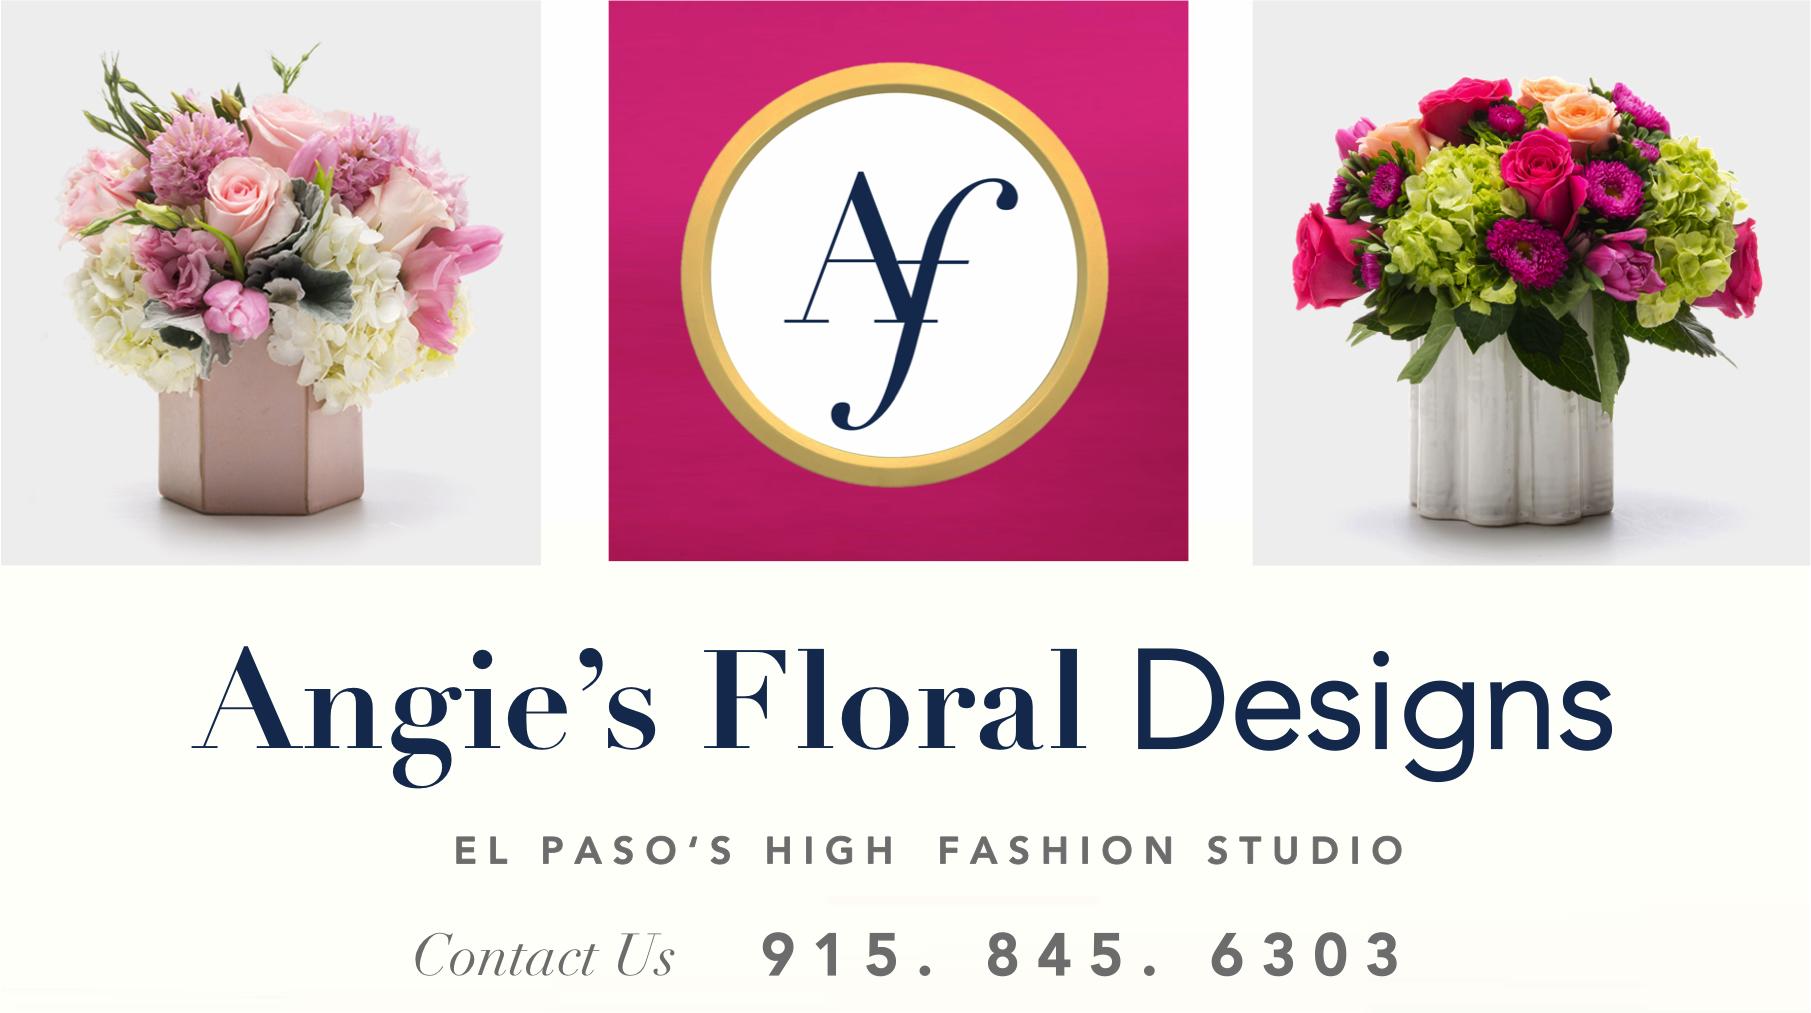 01-angies-1-floral-design-roses-contact-flowershop-flores-floreria-el-paso-design-flowershops-flowershop-79912-el-paso-florist-79912.png